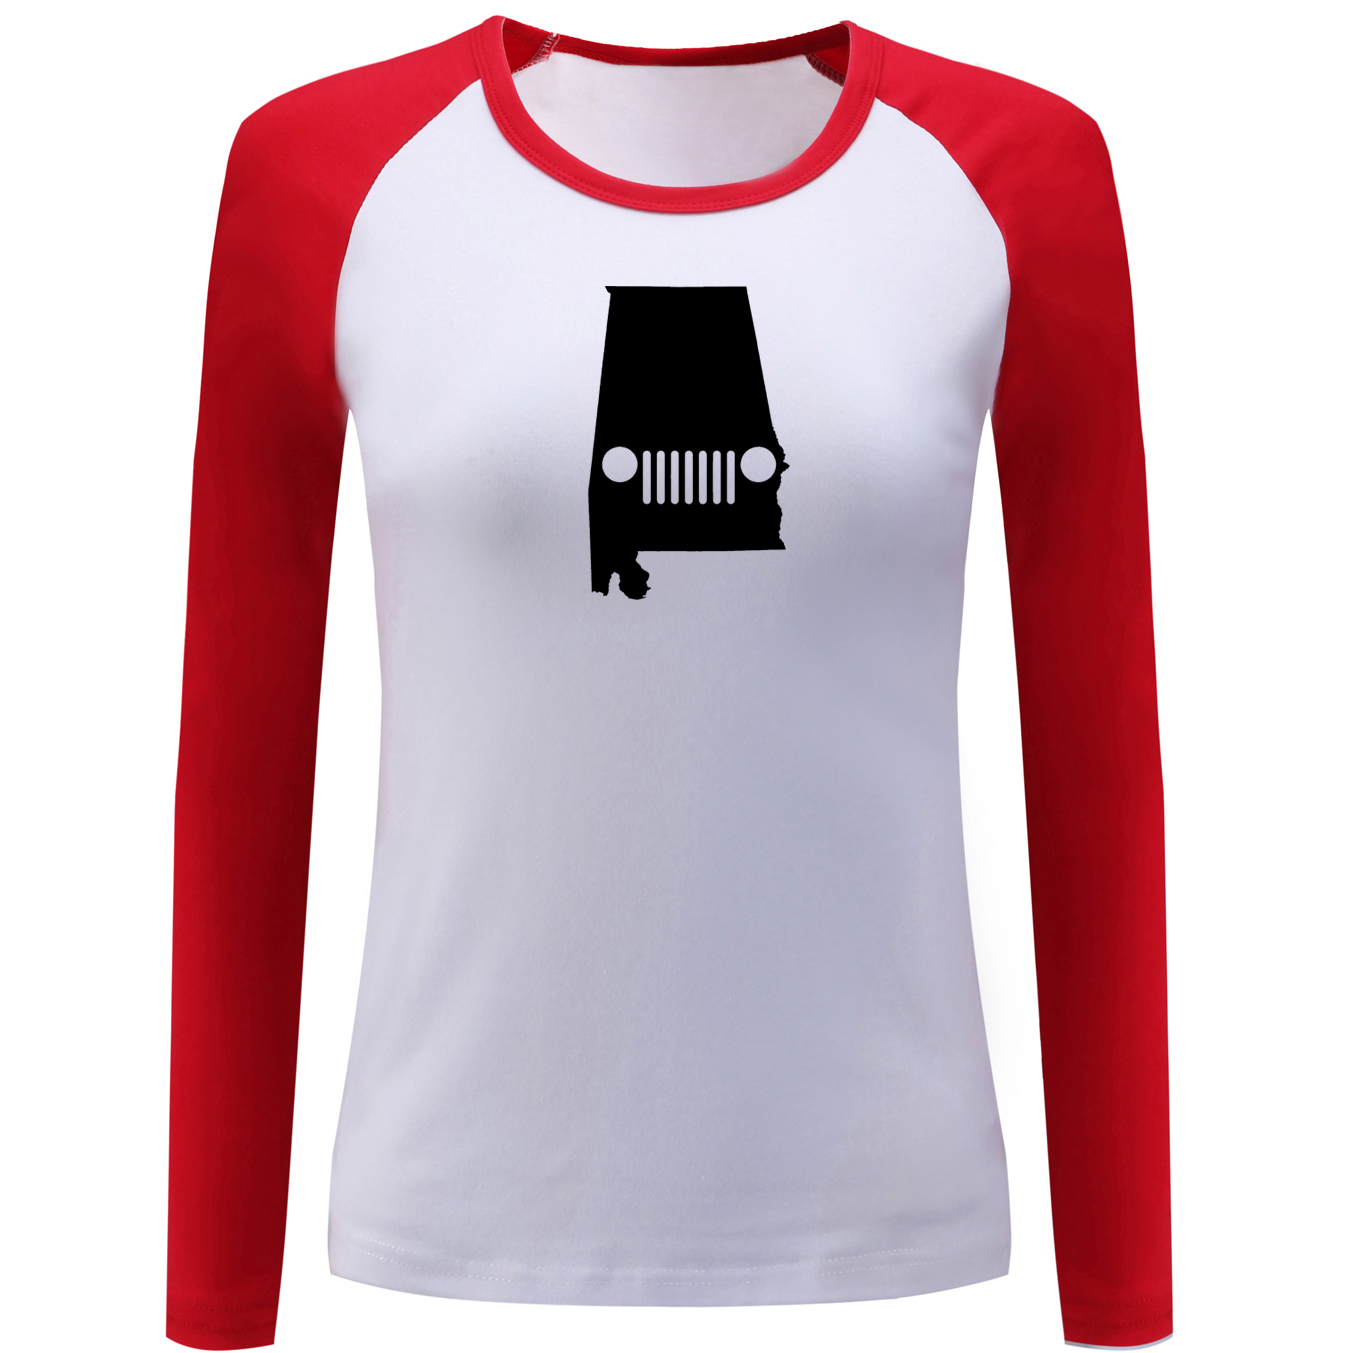 iDzn Fashion Womens Raglan T Shirt Alabama Jeep Creative Design Long Sleeve T-shirt Lady Girl Casual Tops for Christmas Gift